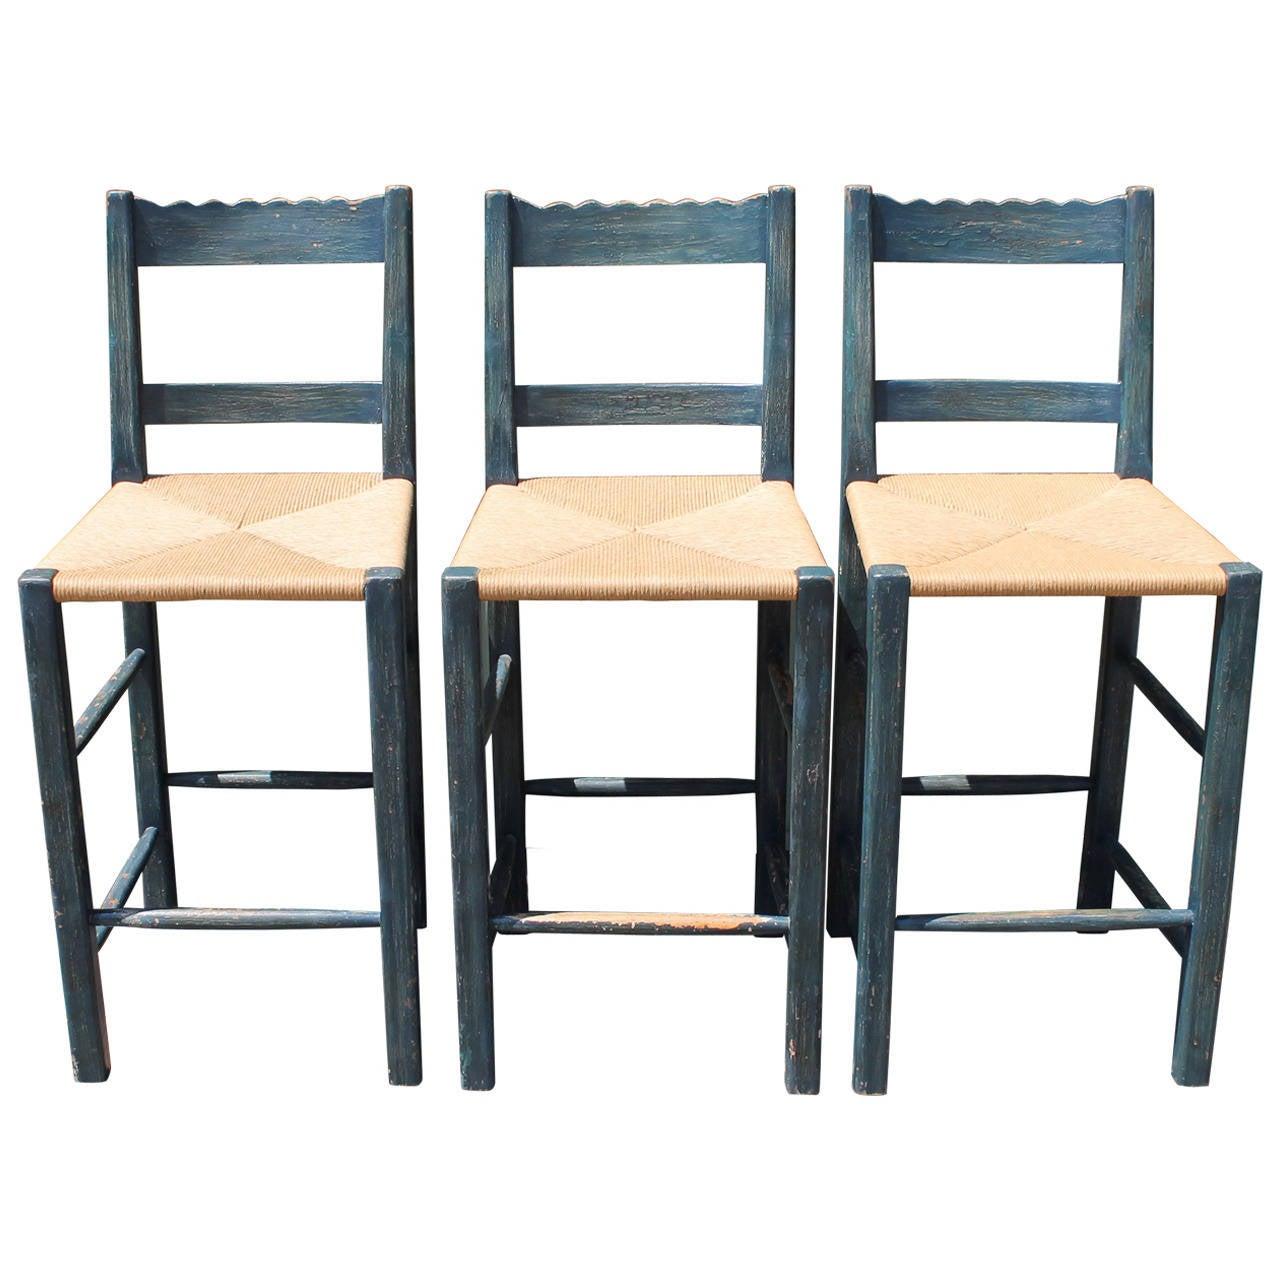 Set of three painted bar stools, 1930s